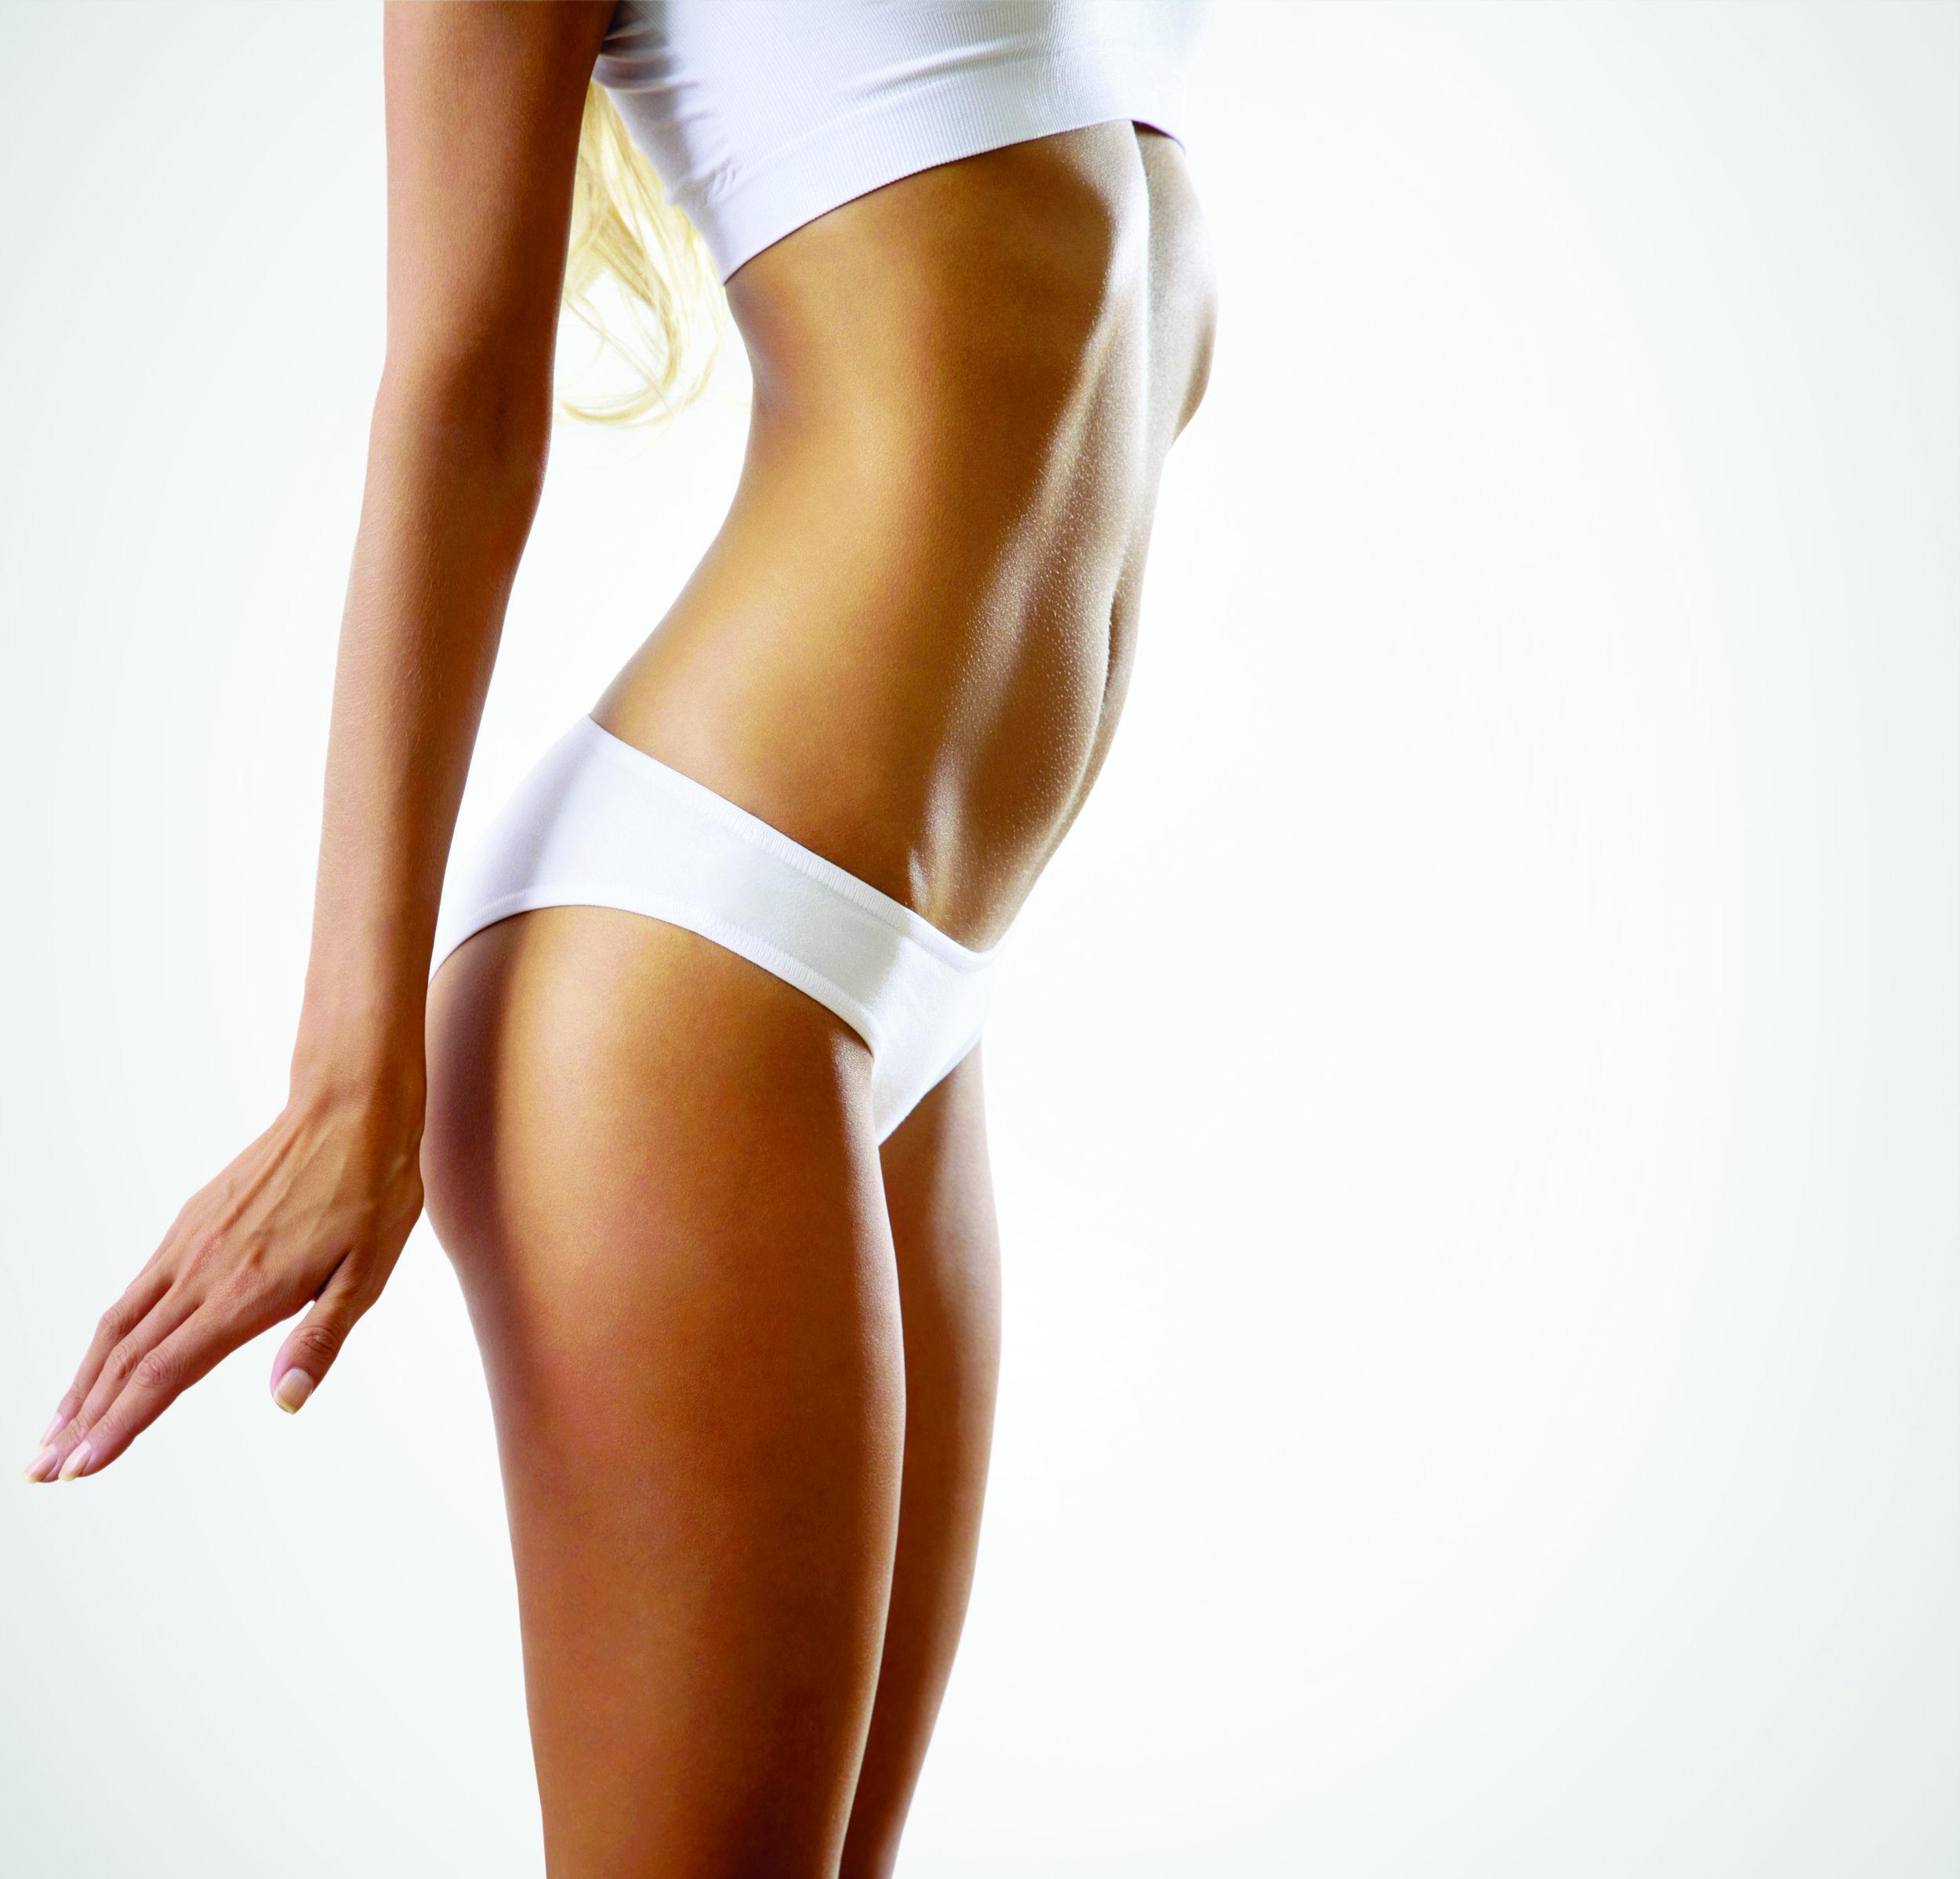 Slimming, toning, cellulite, fat cells, stubborn fat, tummy fat, cellusonic, non-surgical lipo sculpture, detox